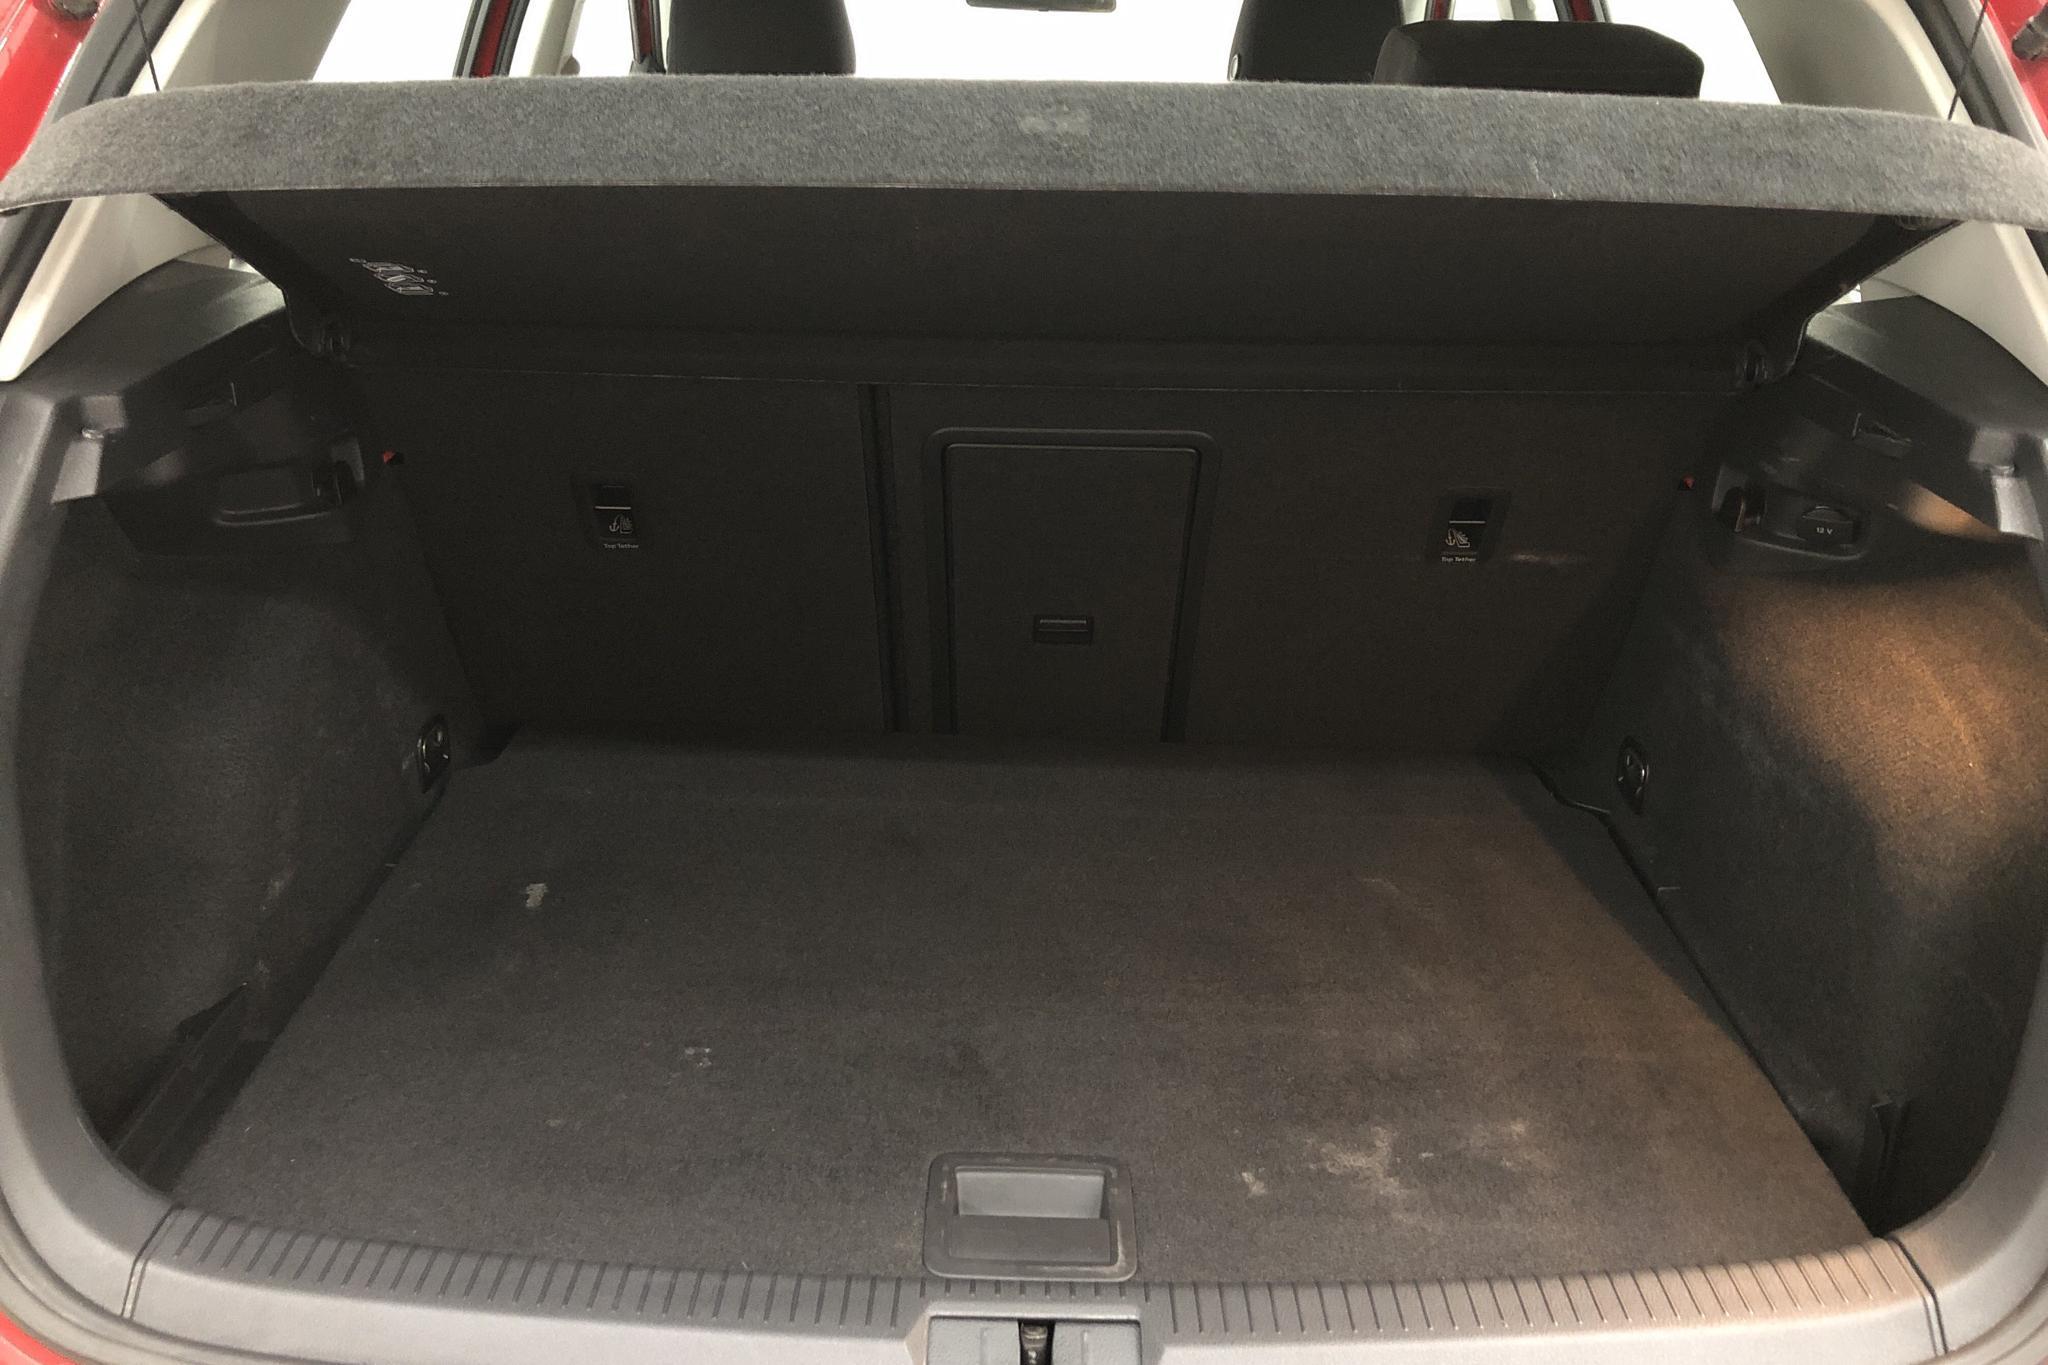 VW Golf VII 1.4 TSI Multifuel 5dr (125hk) - 7 033 mil - Manuell - röd - 2018